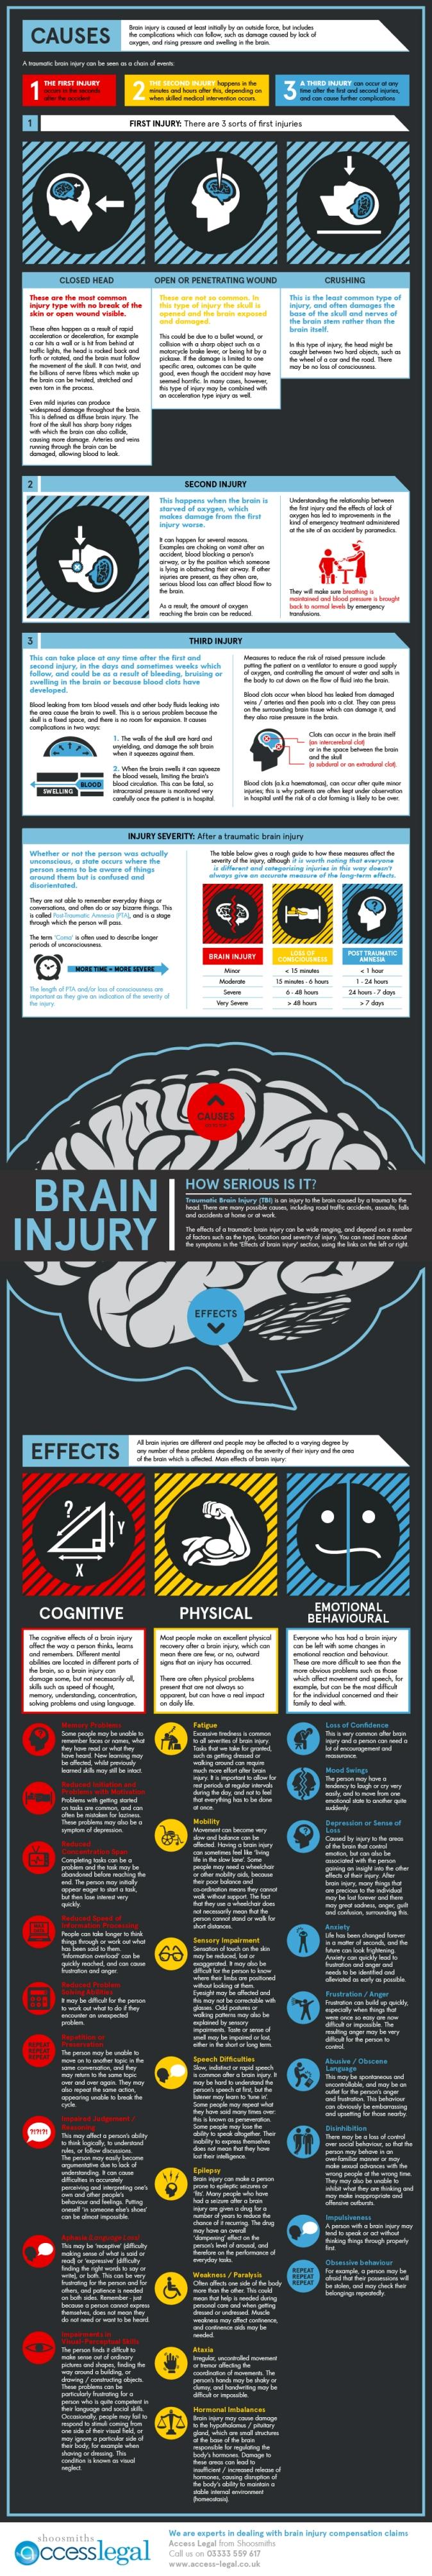 brain-injury--how-serious-is-it_5061954cebacb